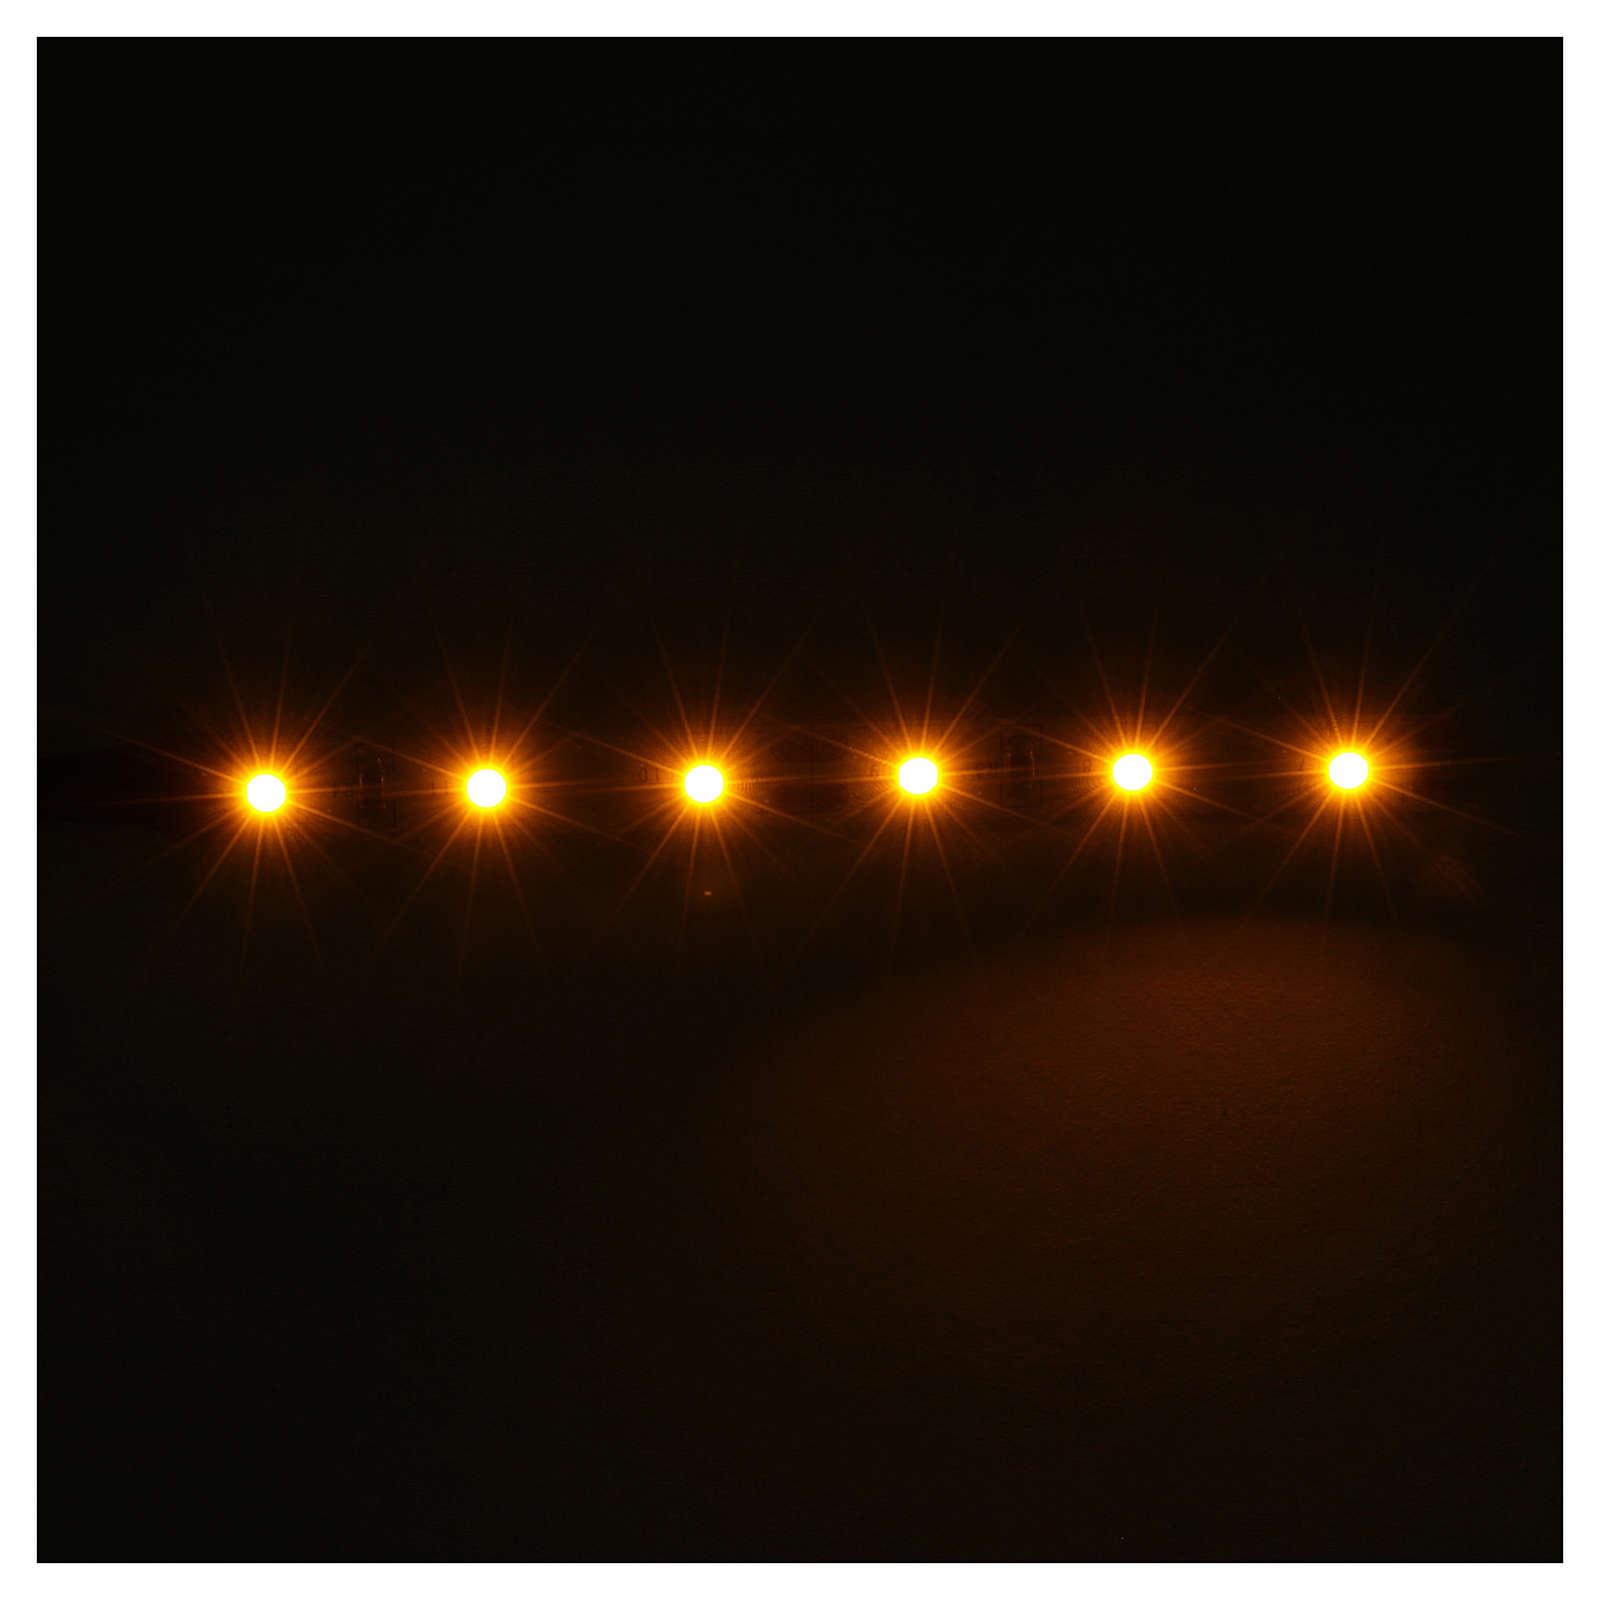 Tira de 6 LED cm. 0.8x8 cm. amarilla Frisalight 4